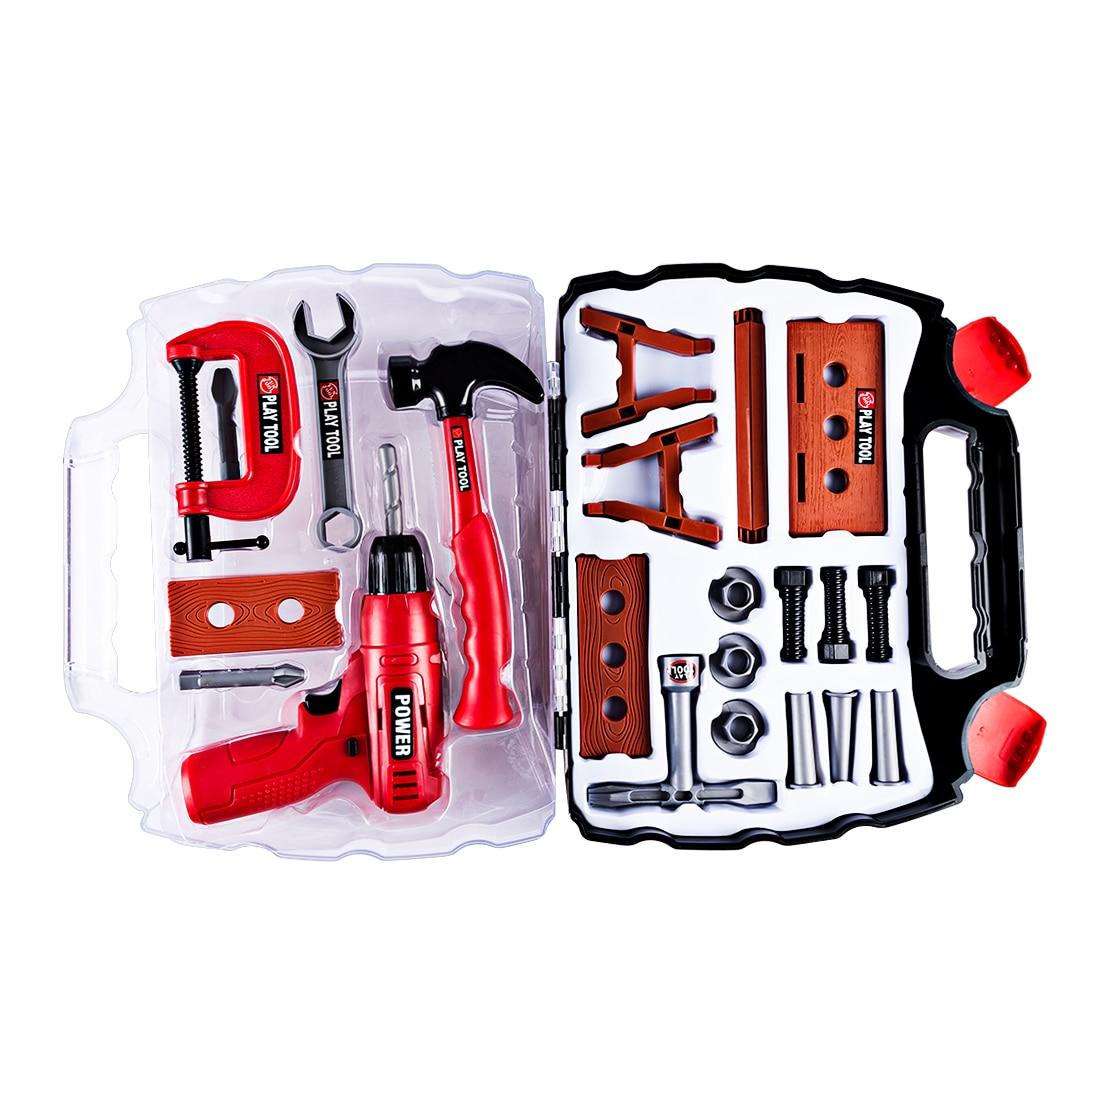 цены на Surwish 22Pcs Children Pretend Play Toys Electric Tool Set Educational Gift Early Educational Toys For Kid  в интернет-магазинах